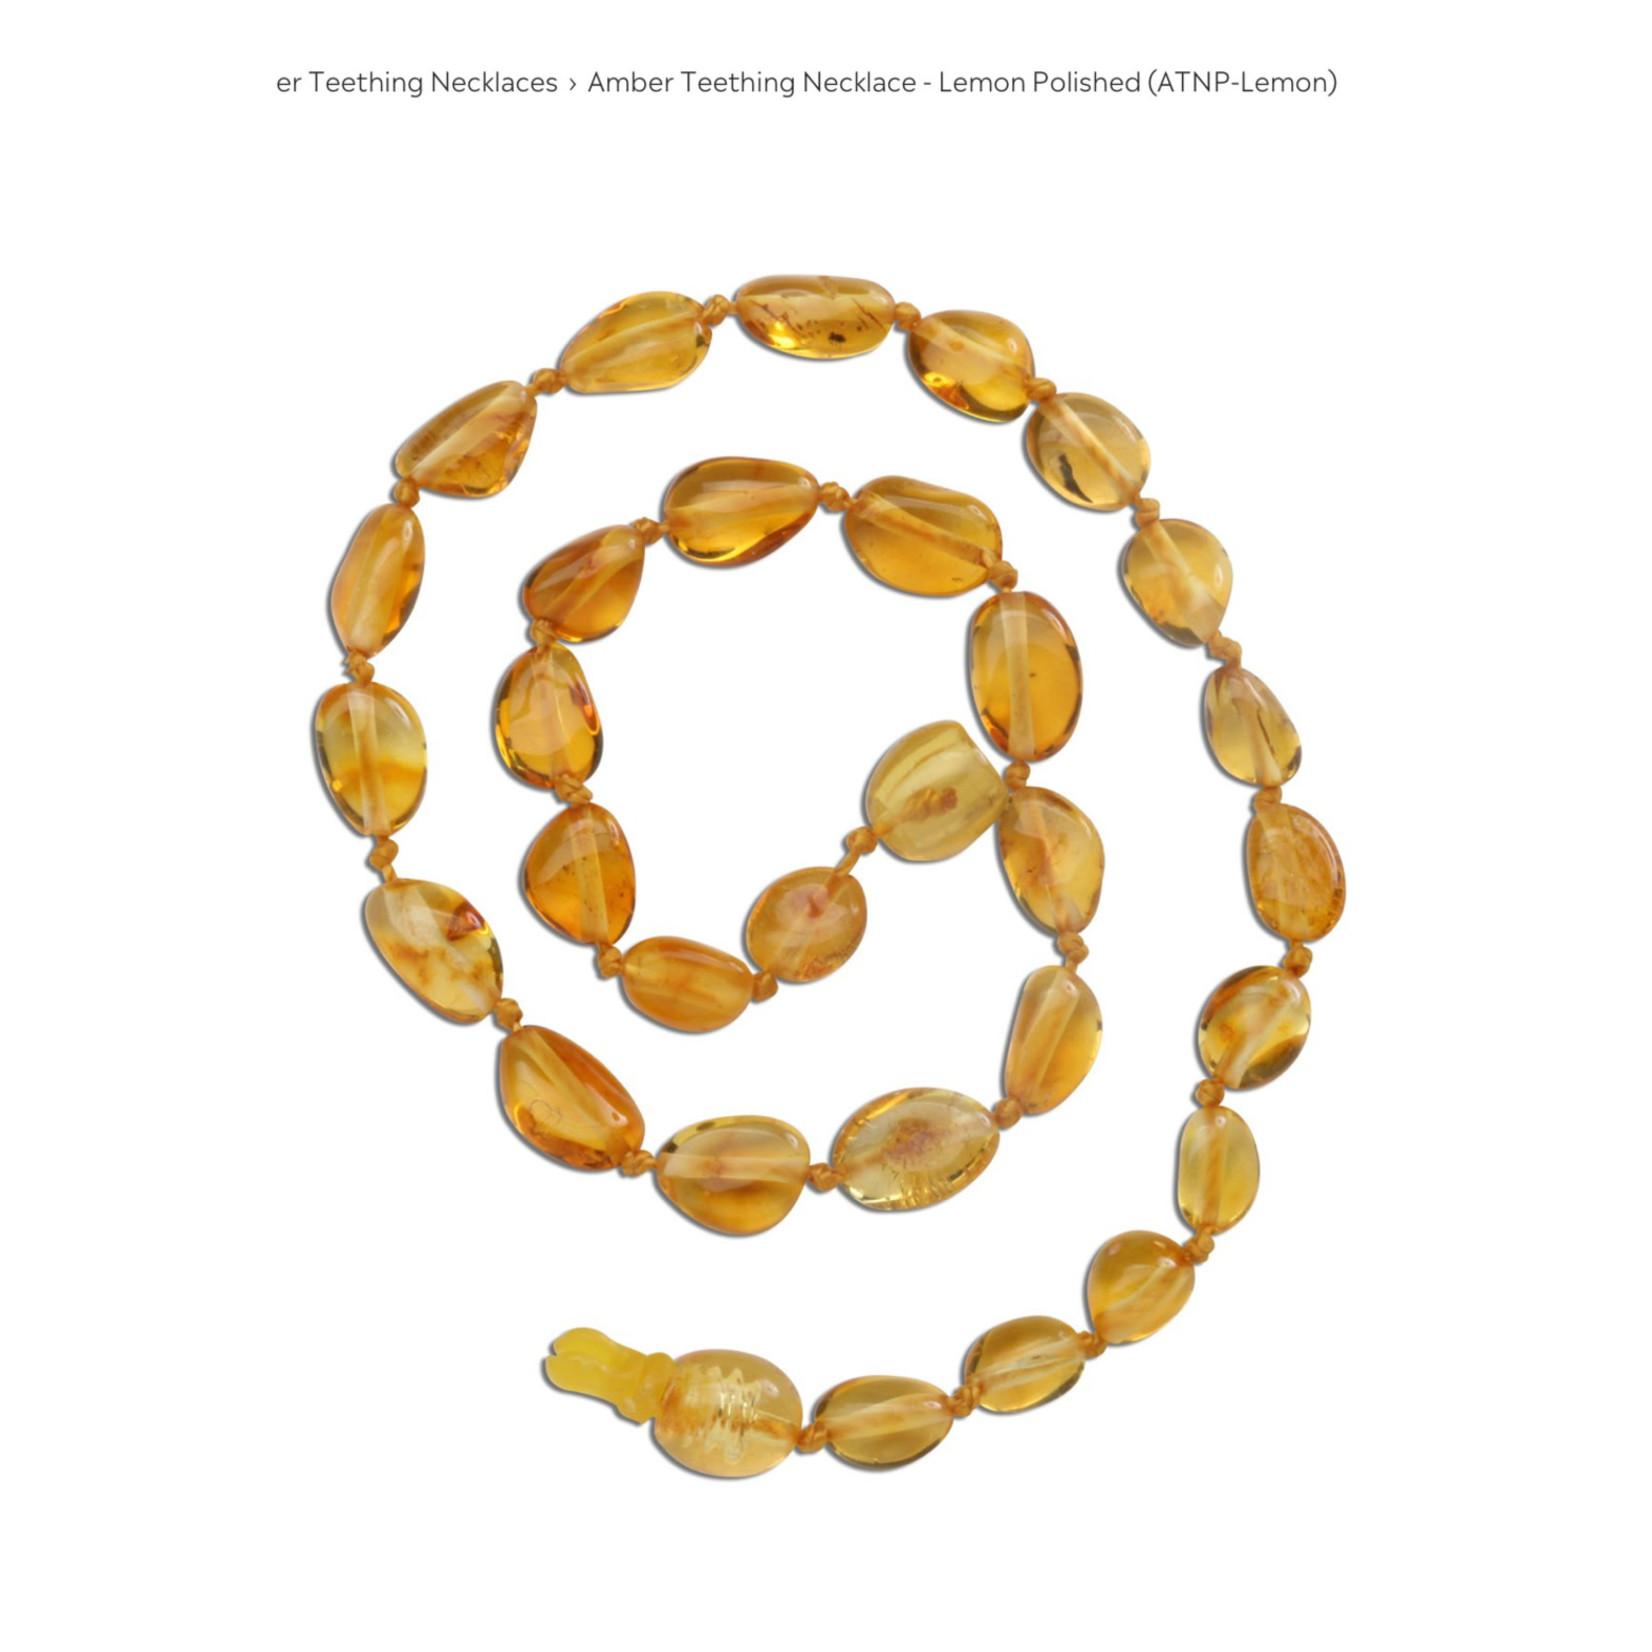 Cherished Moments Baltic Amber Beads - Lemon Polished, MED (12 - 12.5)